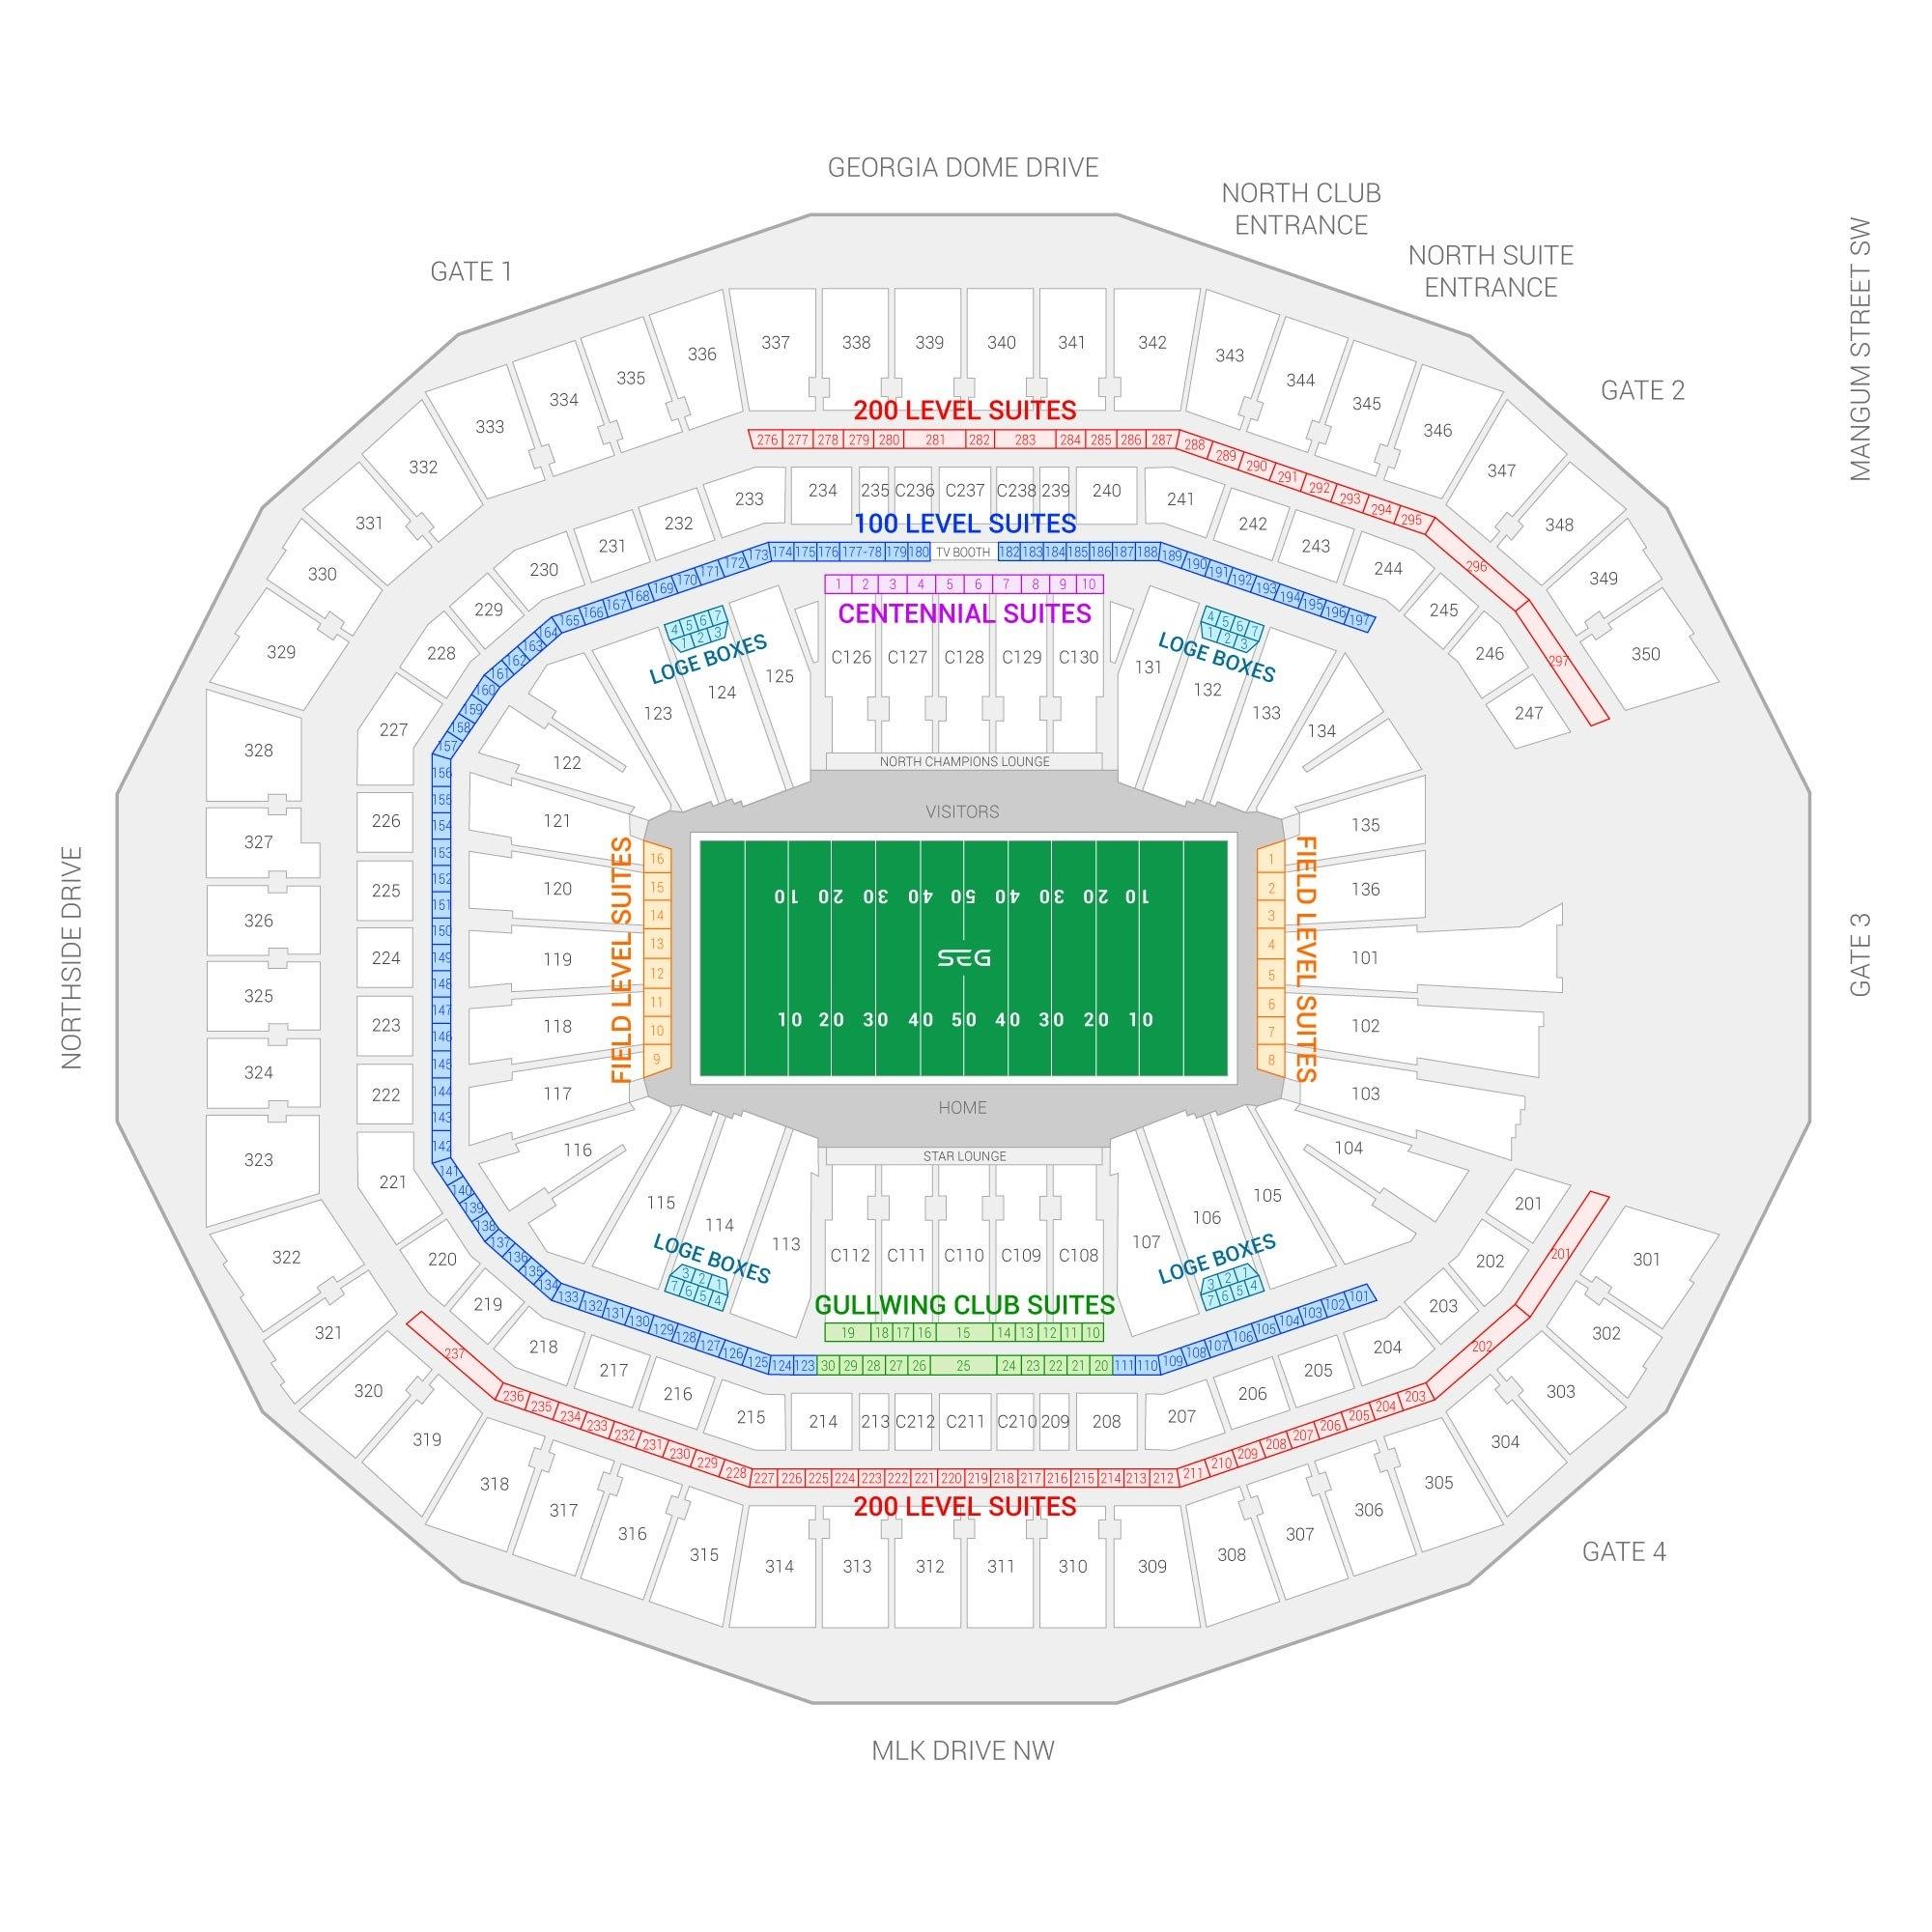 Super Bowl Liii Suite Rentals | Mercedes-Benz Stadium regarding Super Bowl 53 Map